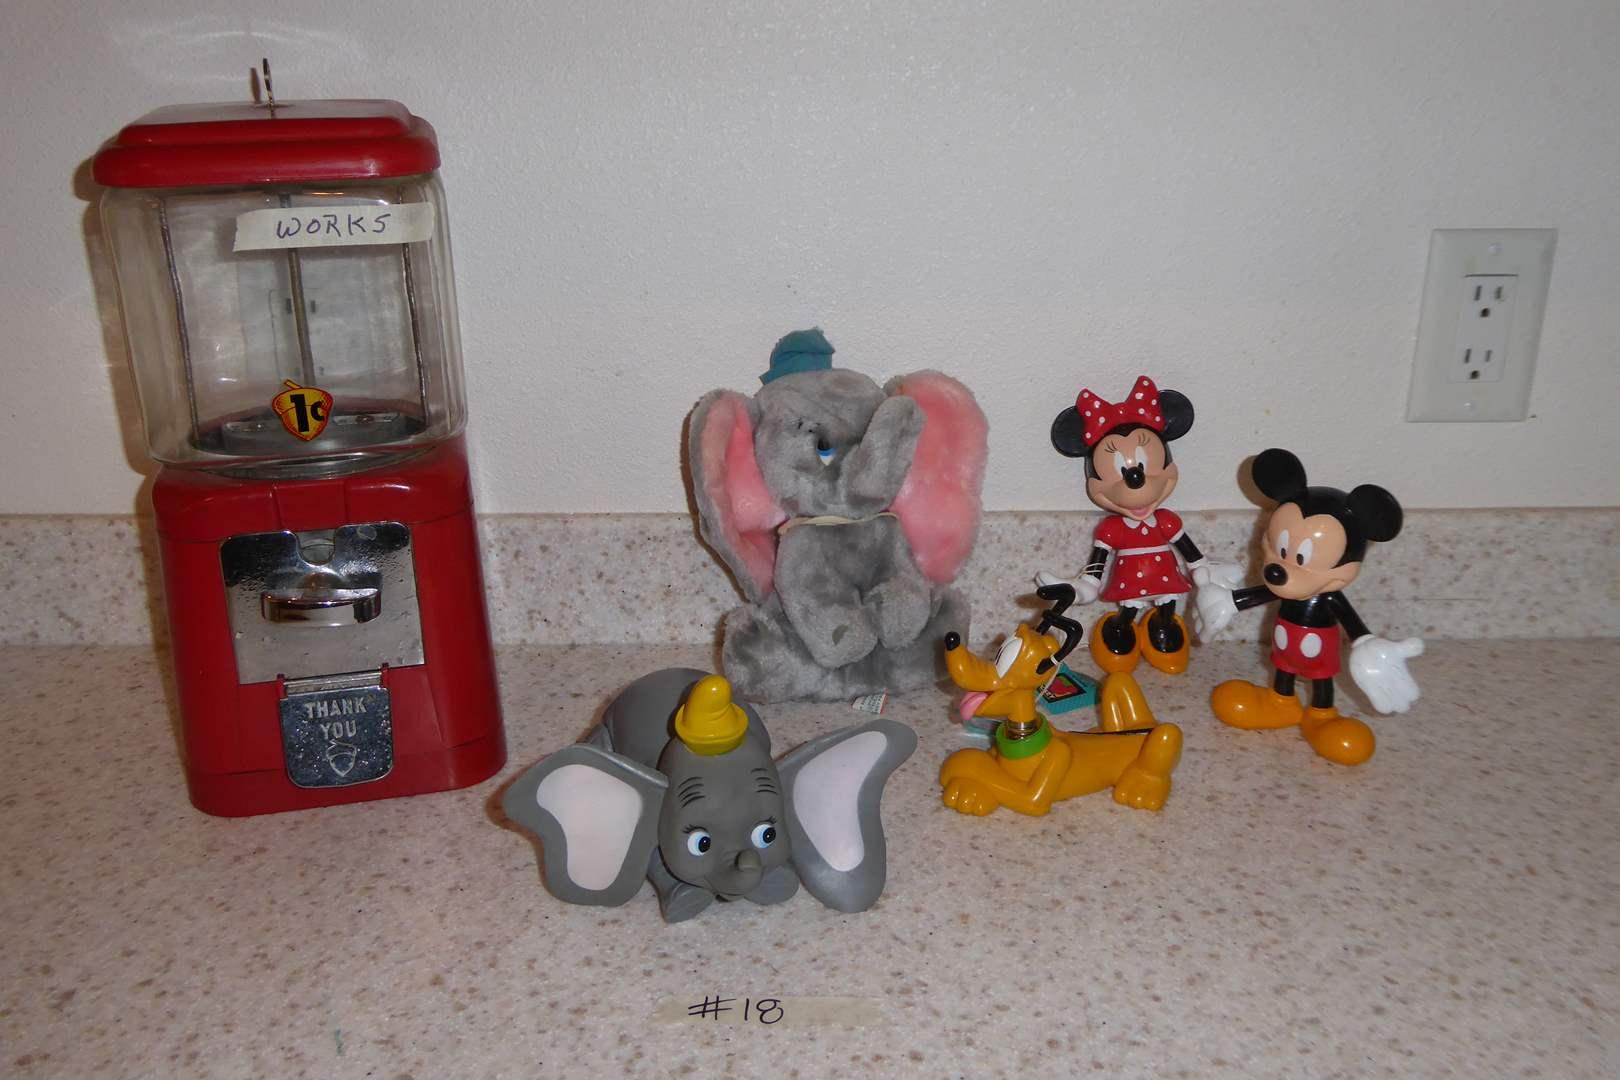 "Lot # 18 - ""Oak Manufacturing Co INC"" Table Top Bubble Gum Machine & Disney Figurines  (main image)"